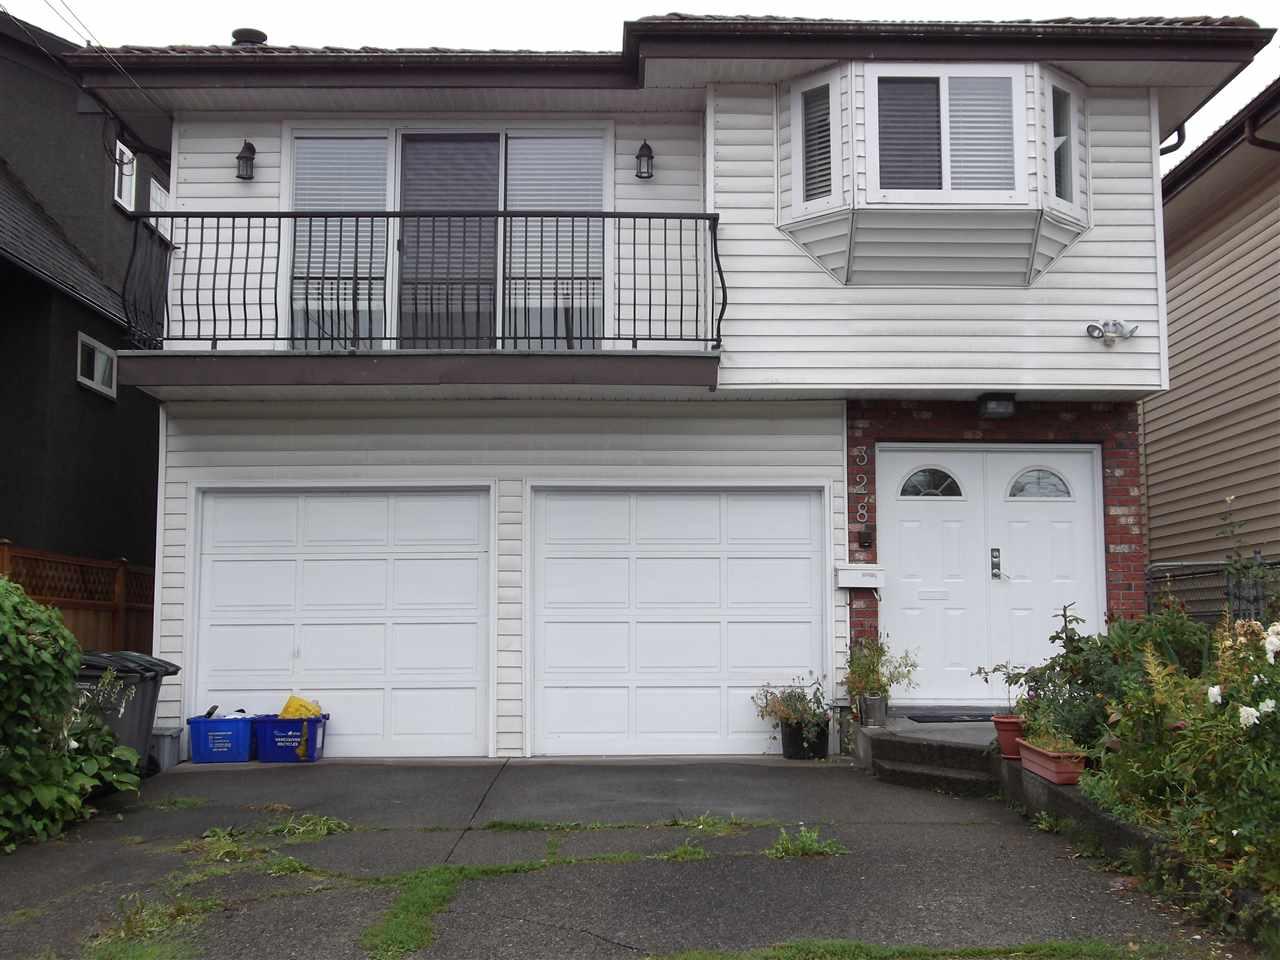 328 E KING EDWARD Main, Vancouver (R2202435)